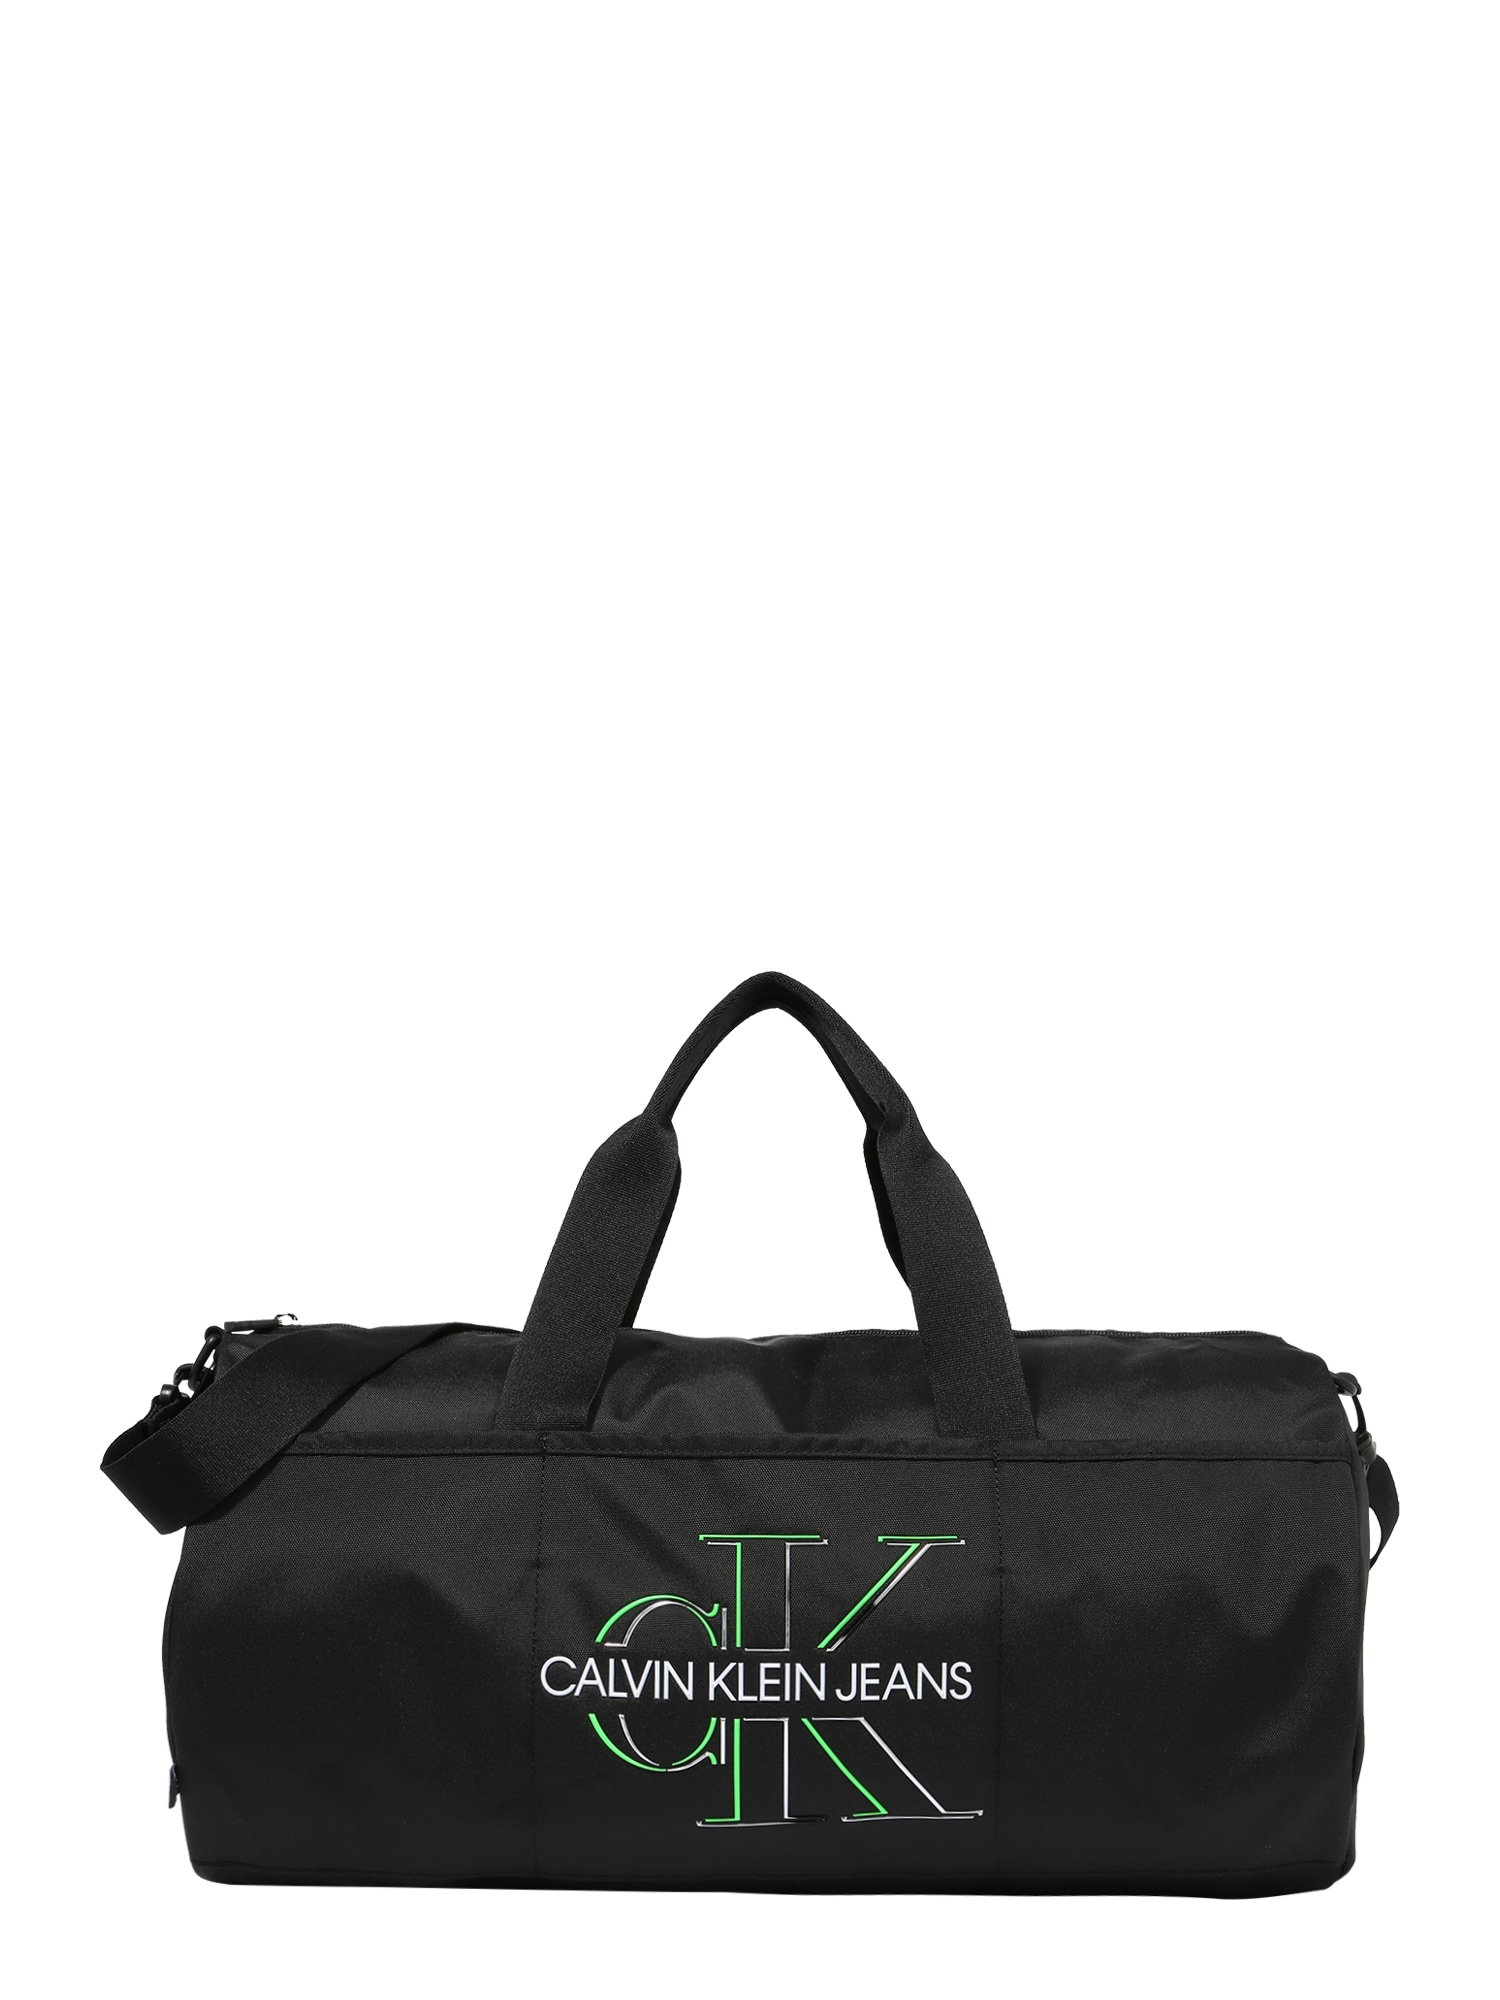 Calvin Klein Jeans Kelioninis krepšys